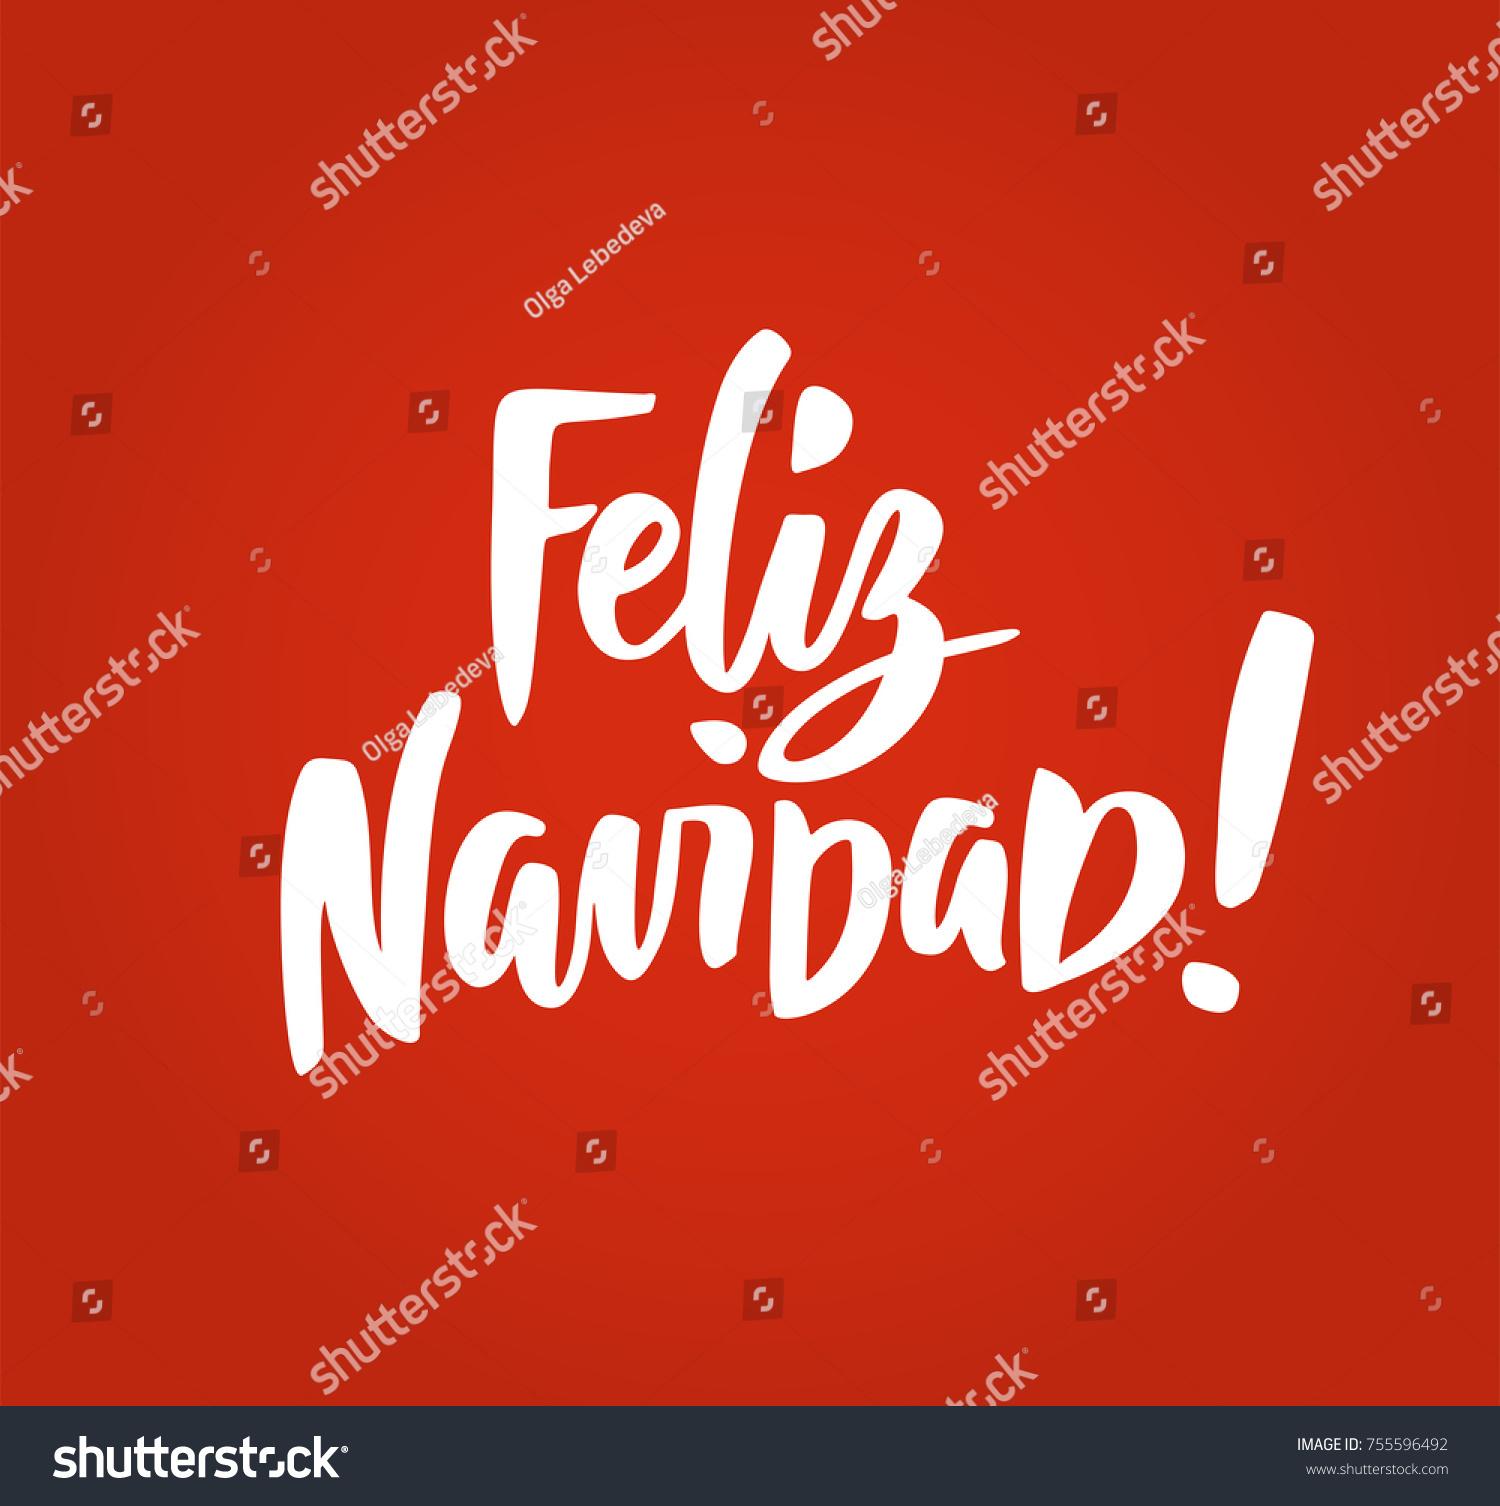 feliz navidad merry christmas spanish quote hand drawn holiday greetings text for christmas